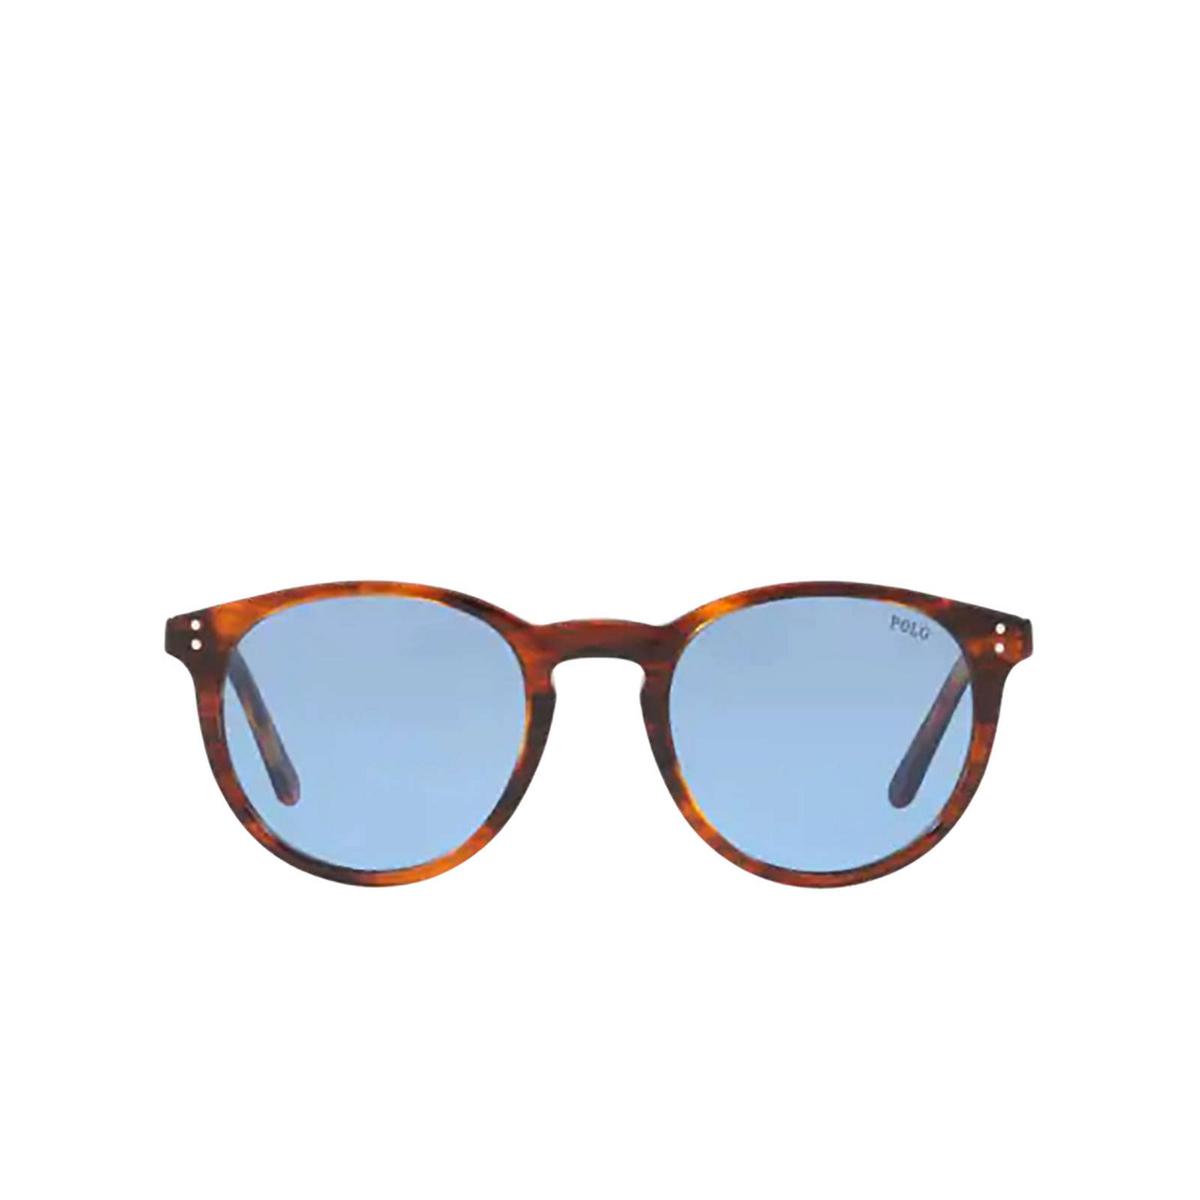 Polo Ralph Lauren® Round Sunglasses: PH4110 color Shiny Striped Havana 500772 - front view.